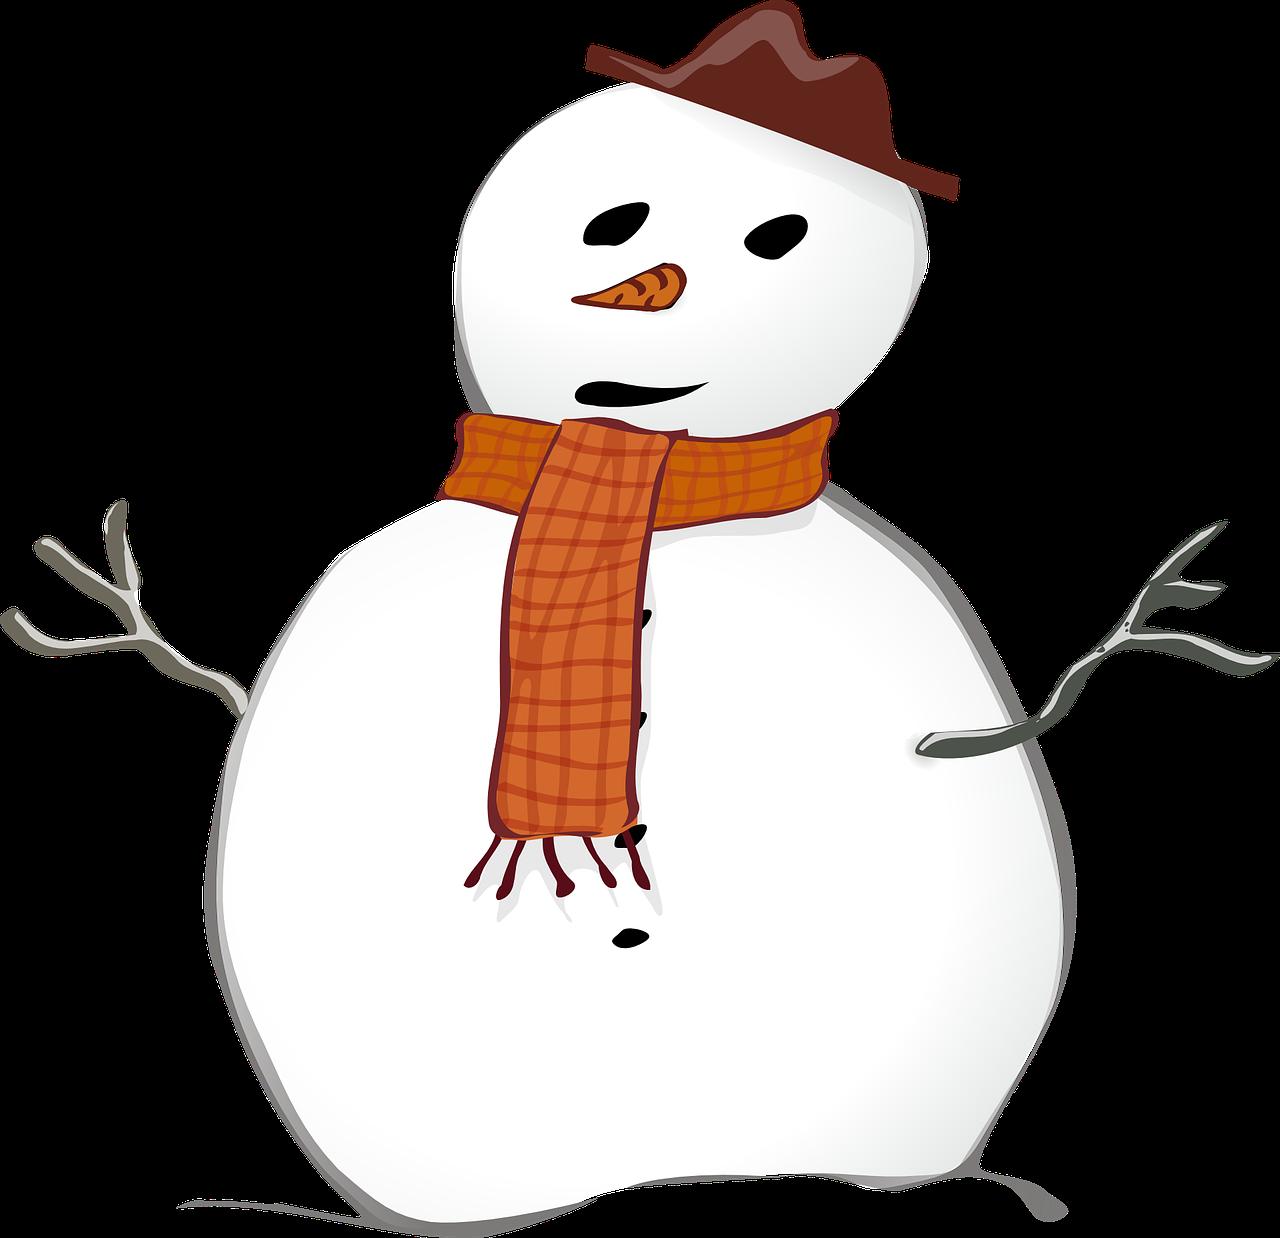 жирный снеговик картинки регулярно собирать